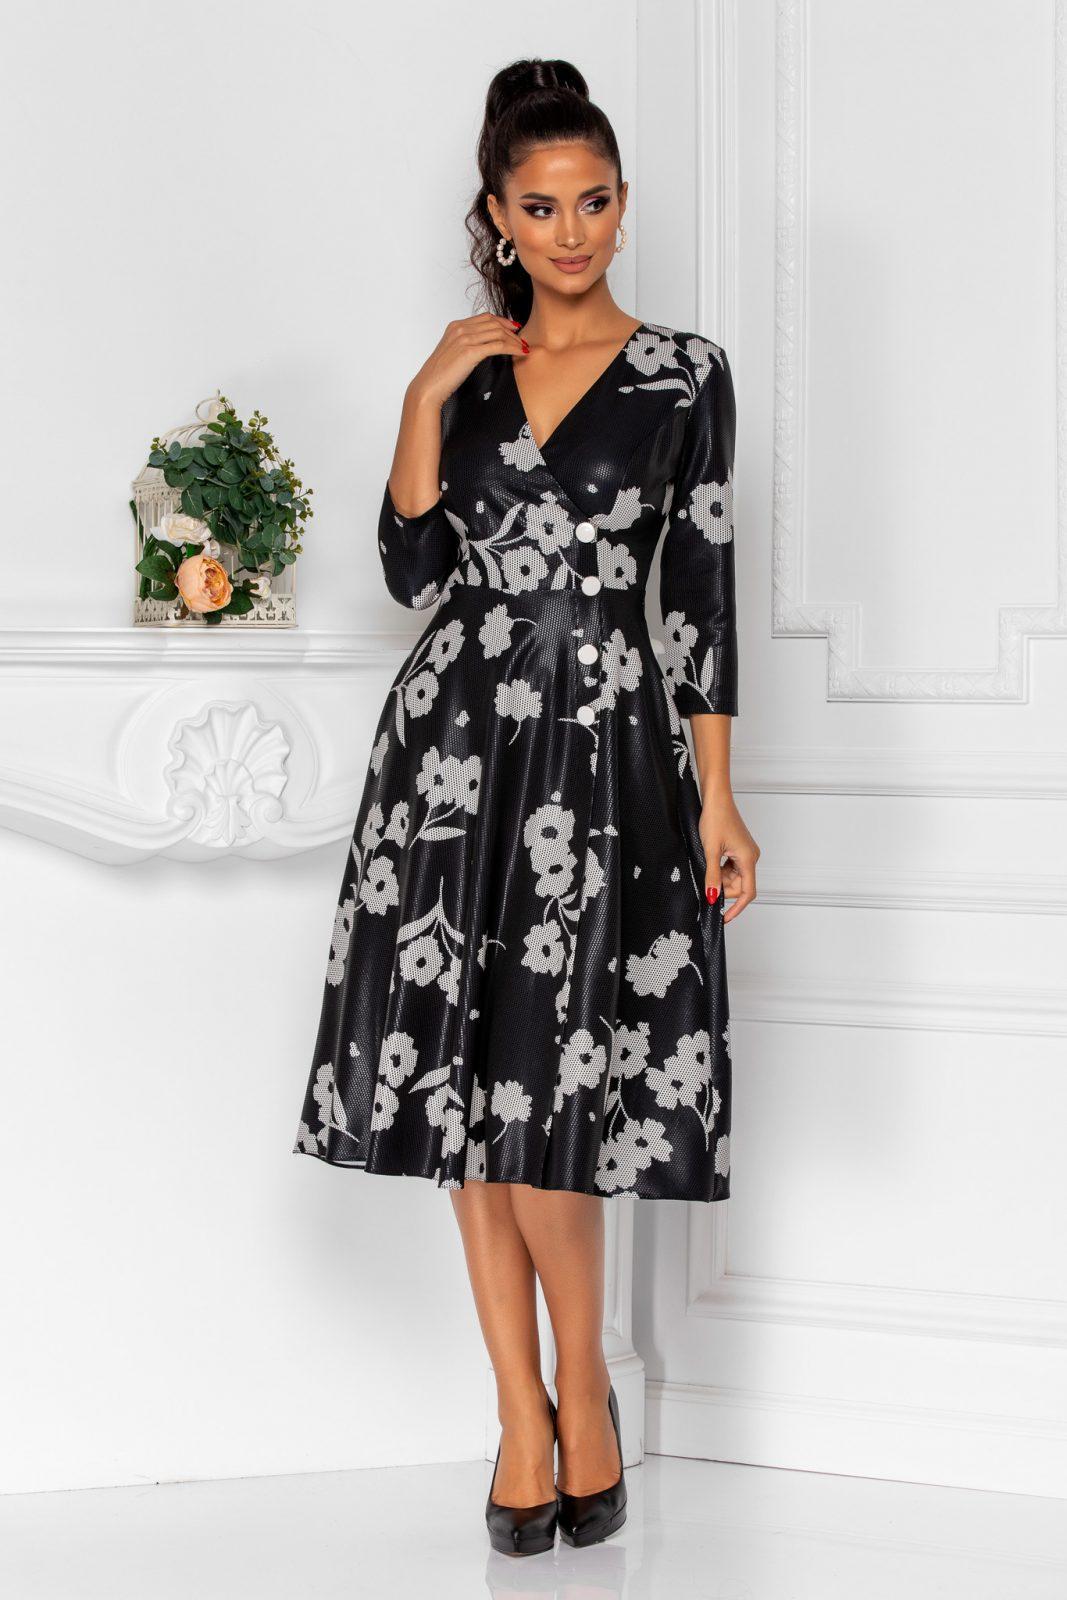 Steff Black Dress